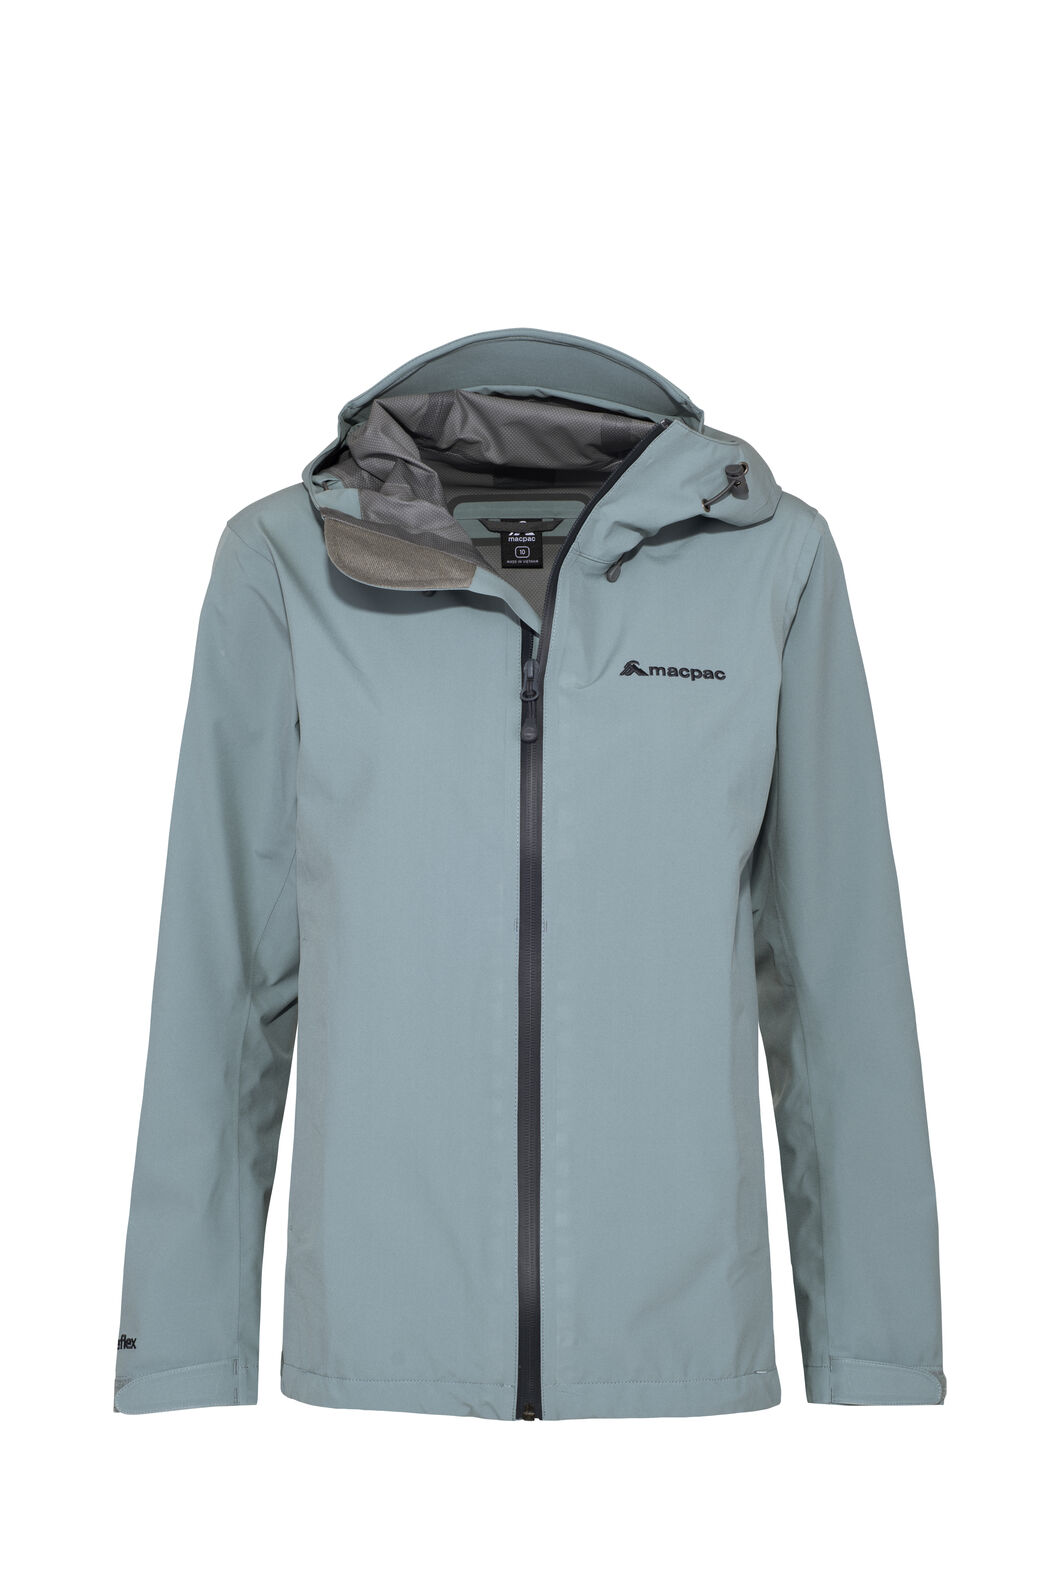 Macpac Dispatch Rain Jacket — Women's, Stormy Sea, hi-res